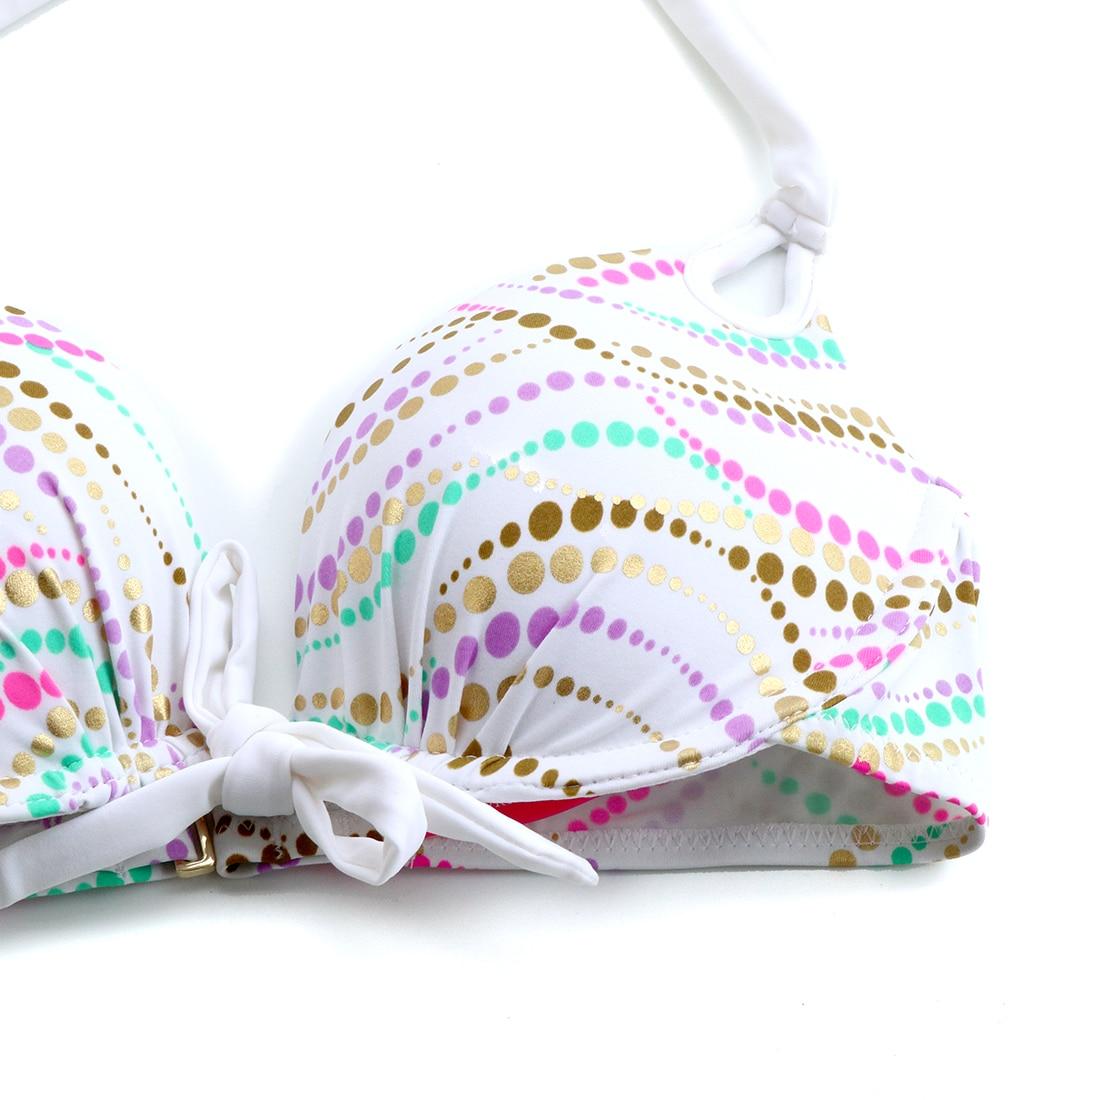 Underwier BIKINIS sets Swim Suit for Women White Bikini  Bathing suits Swimwear Swimming Wave Point Sexy Secret biqini 1